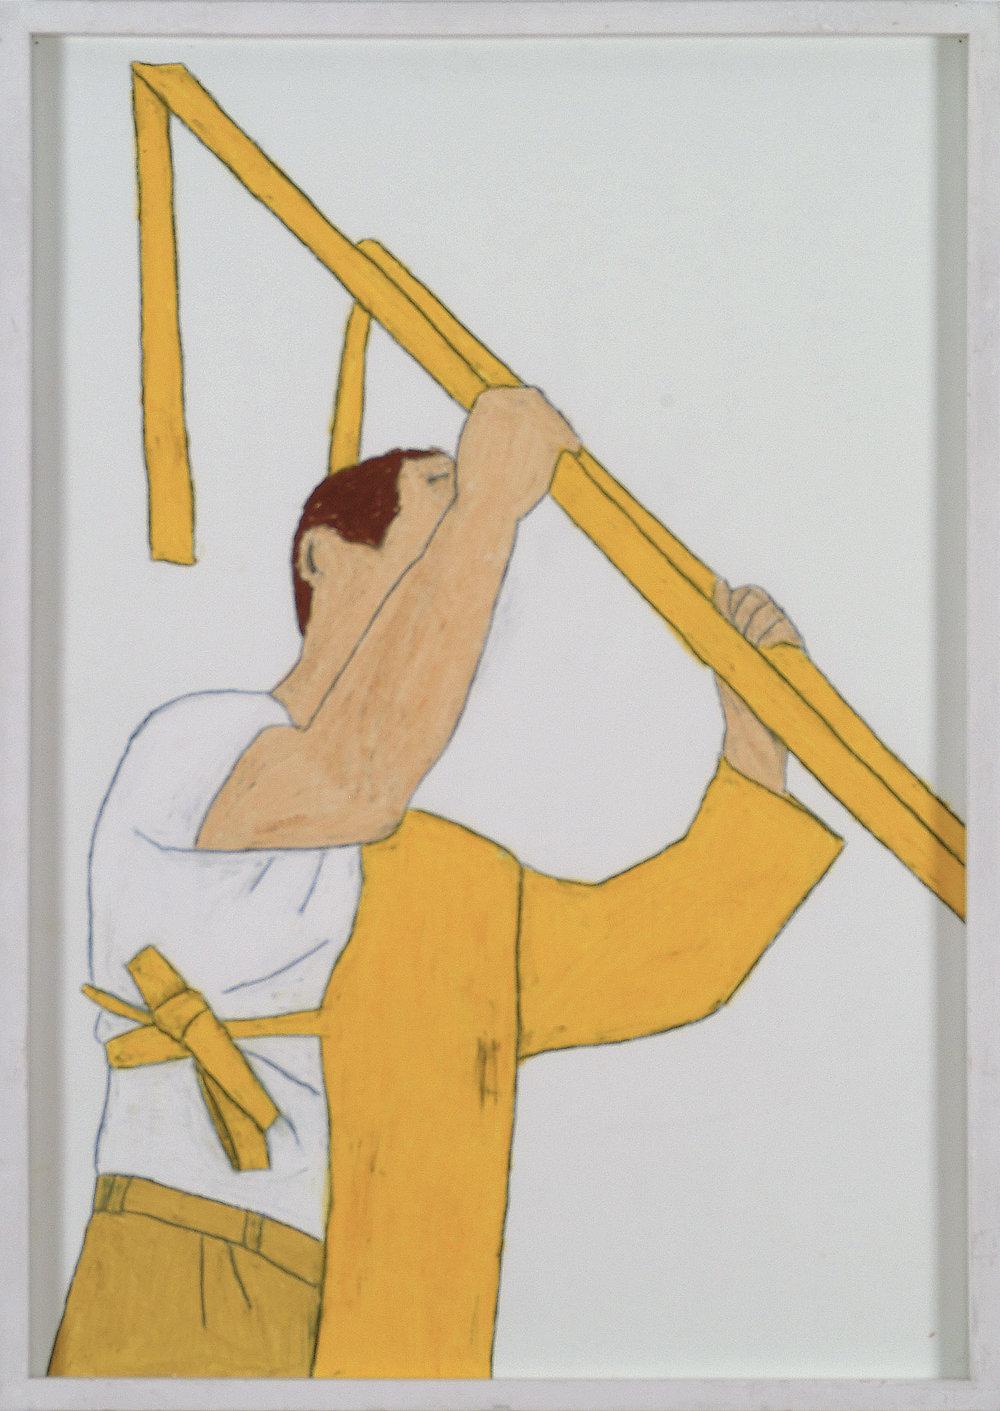 F.E. Walther | Wachskreide auf Papier | 2008 | 84 x 59 cm